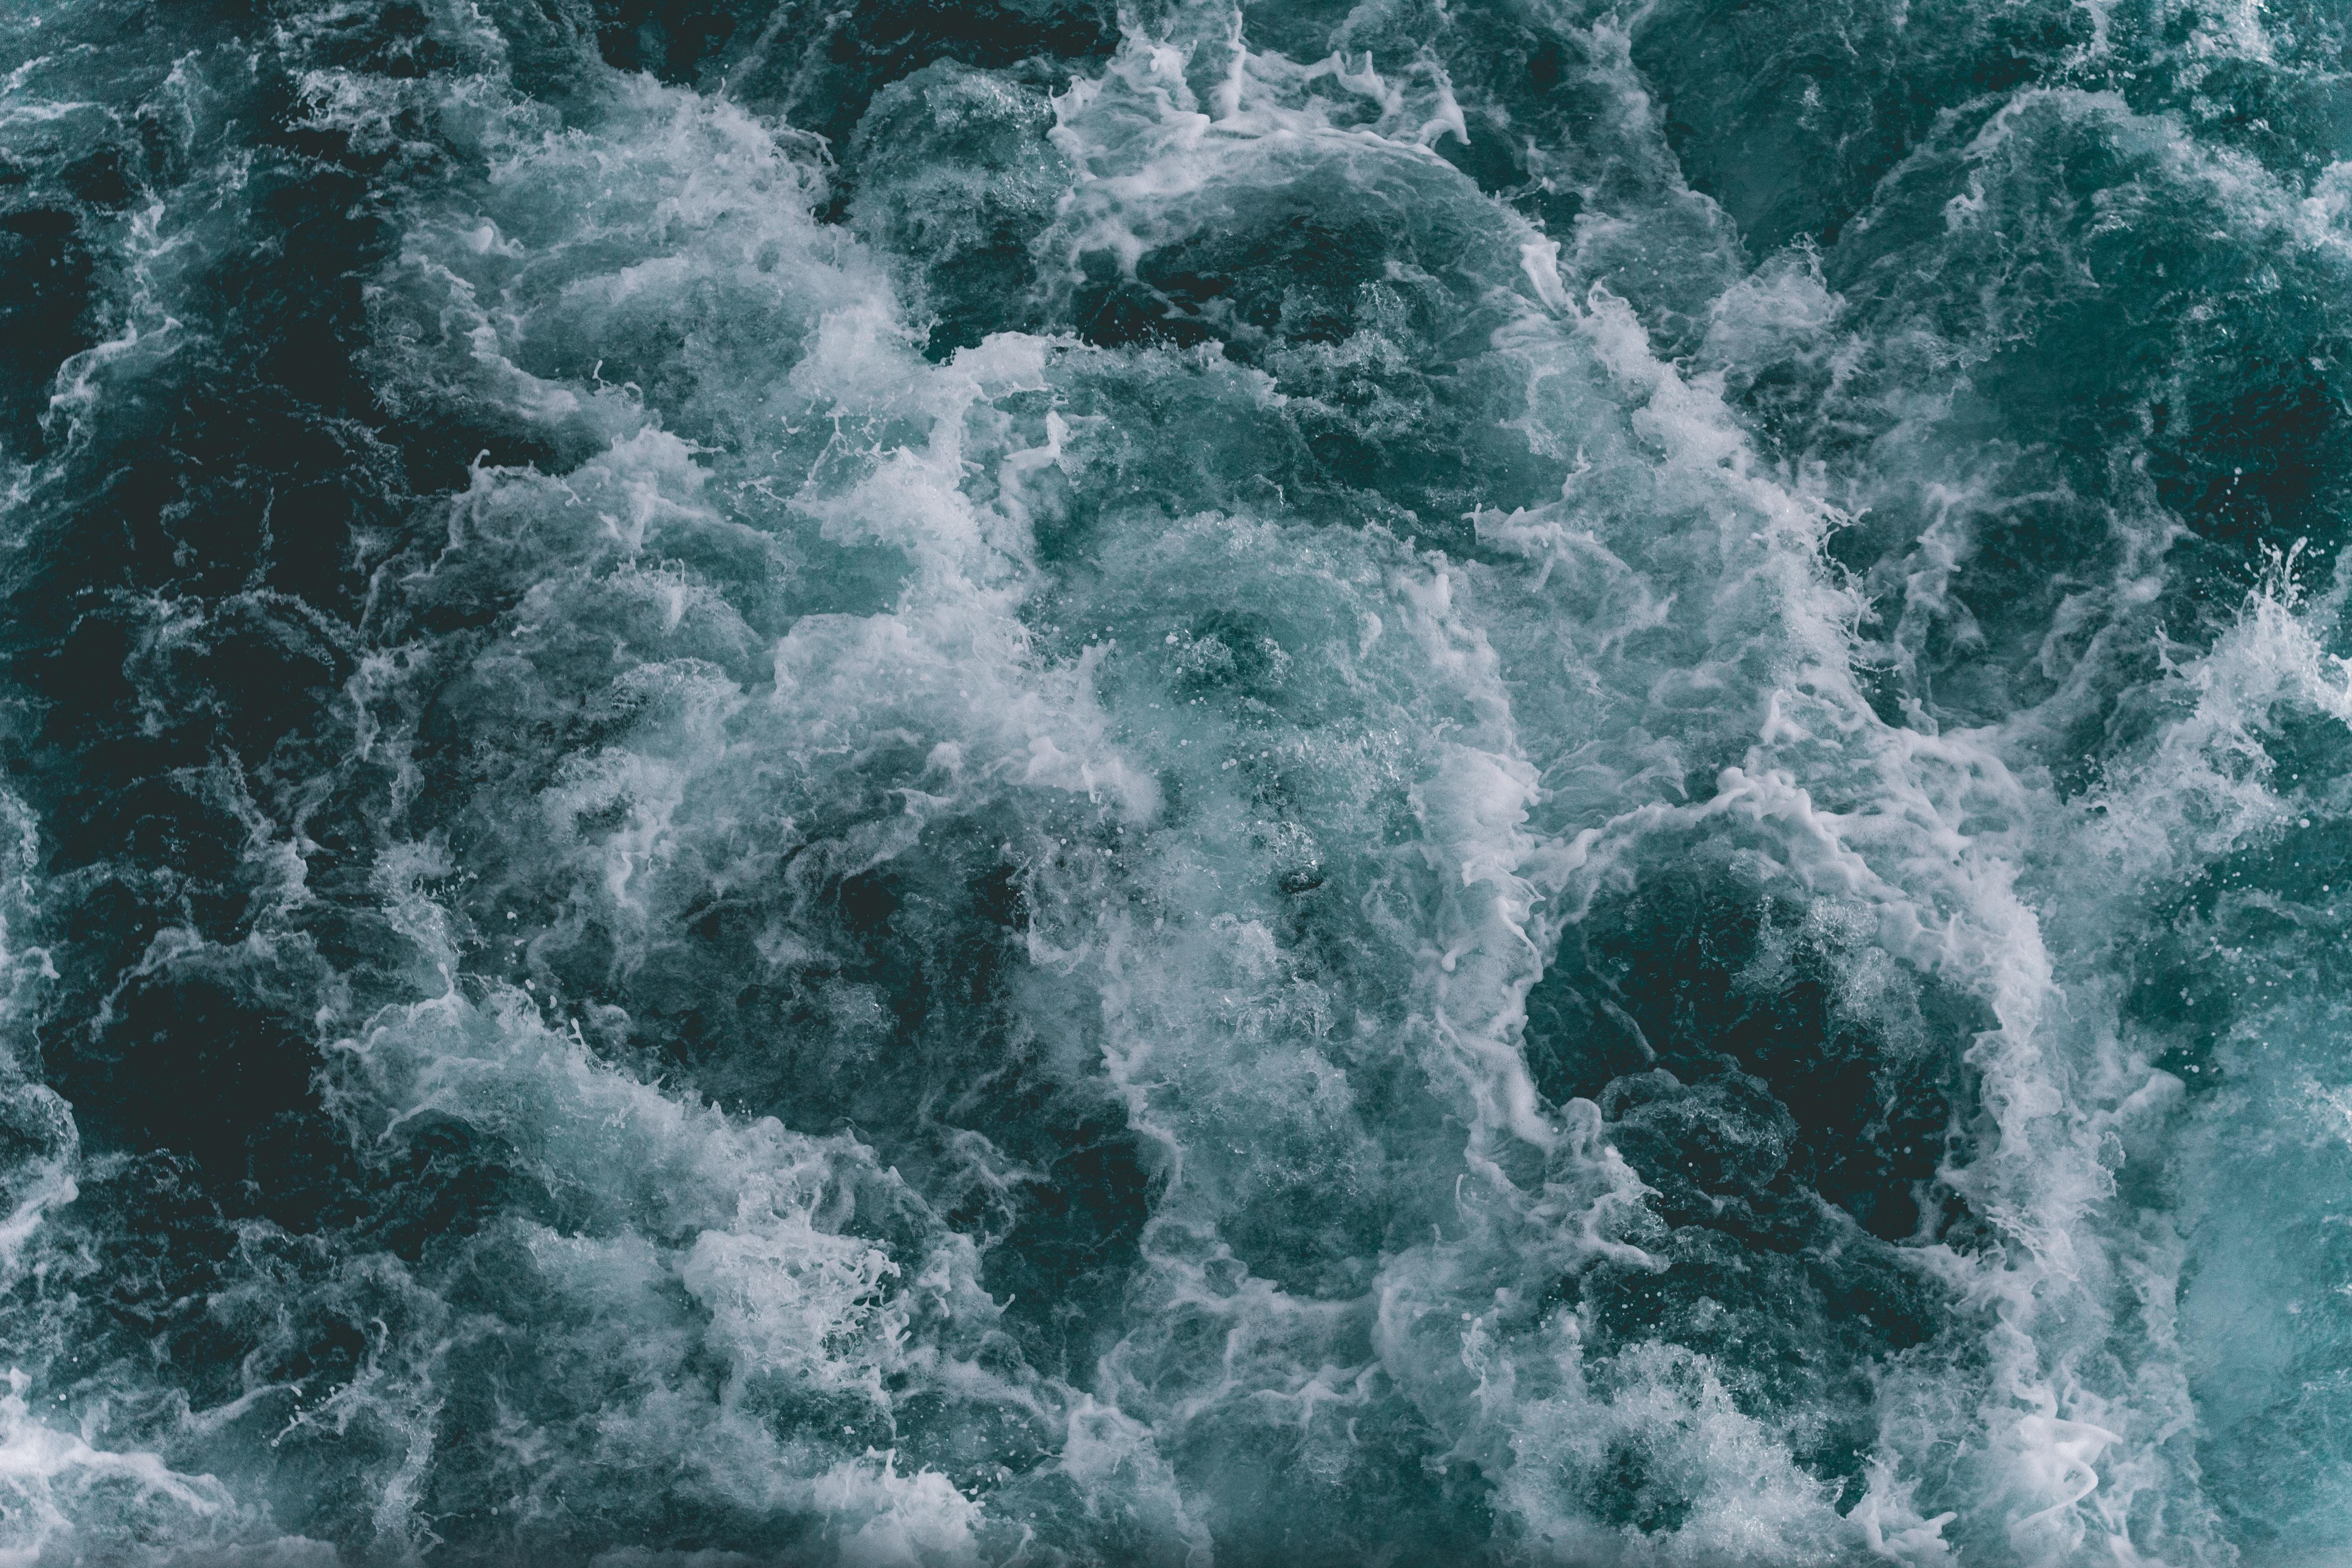 Ocean Waves Free Stock Photo